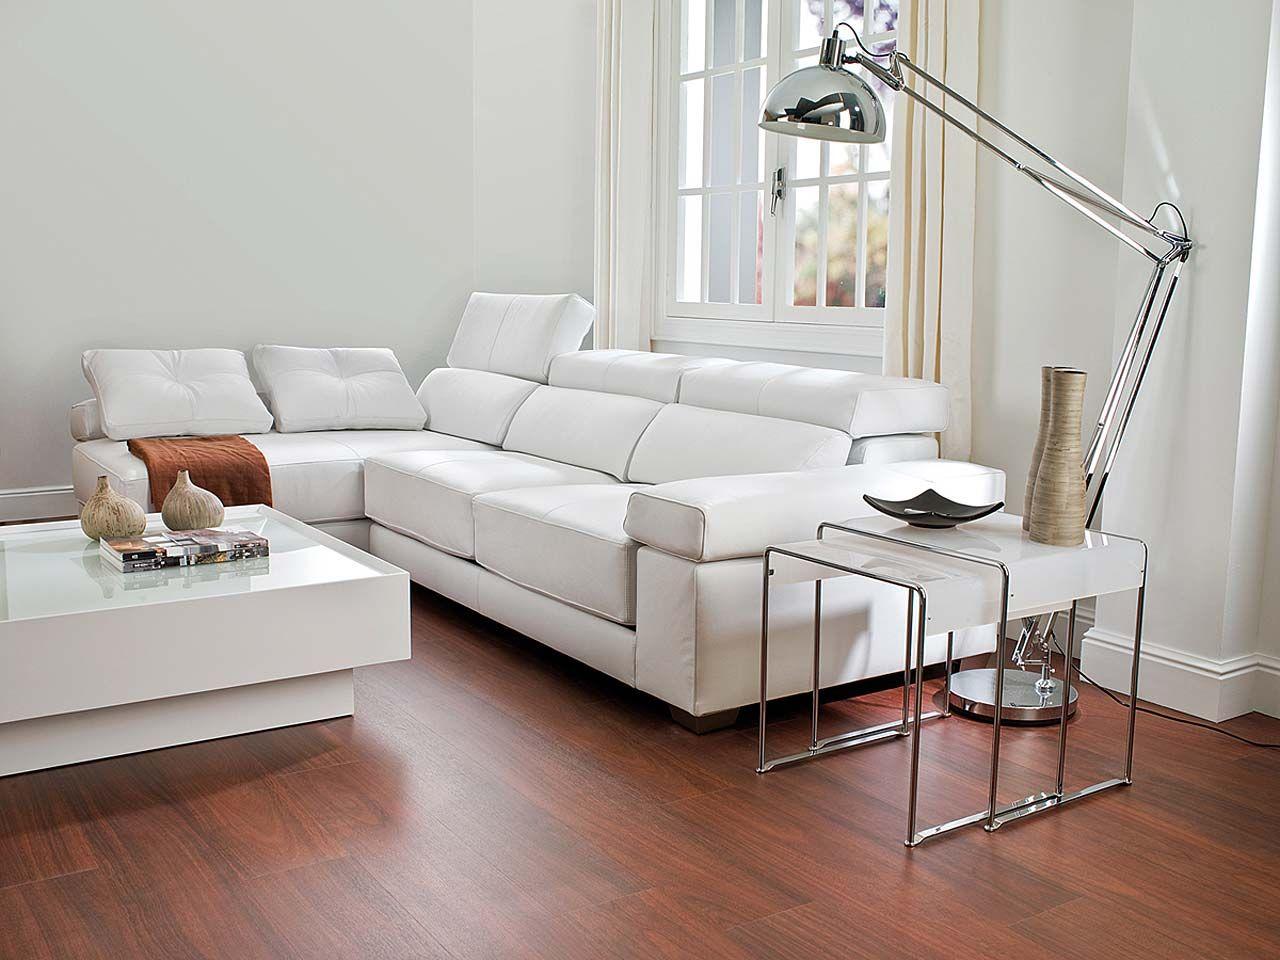 Salas com piso laminado awesome con piso de madera with for Suelos laminados porcelanosa